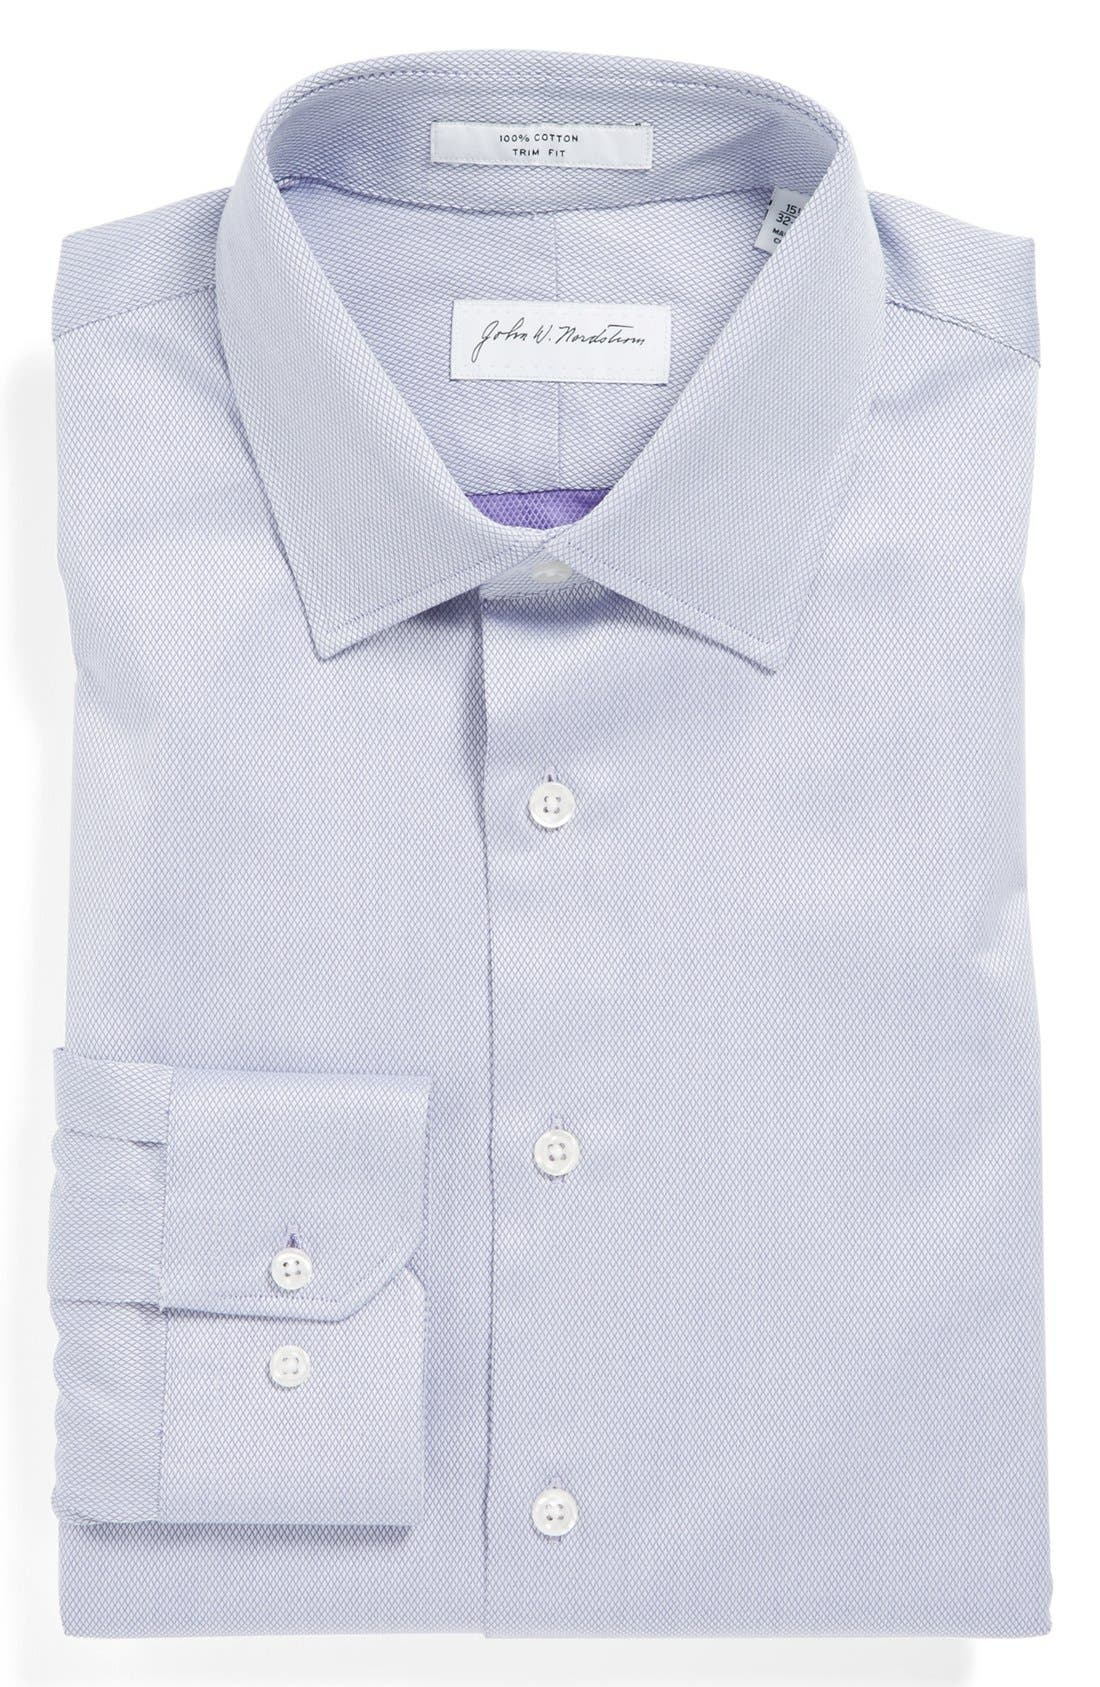 Main Image - John W. Nordstrom® Trim Fit Cotton Dress Shirt